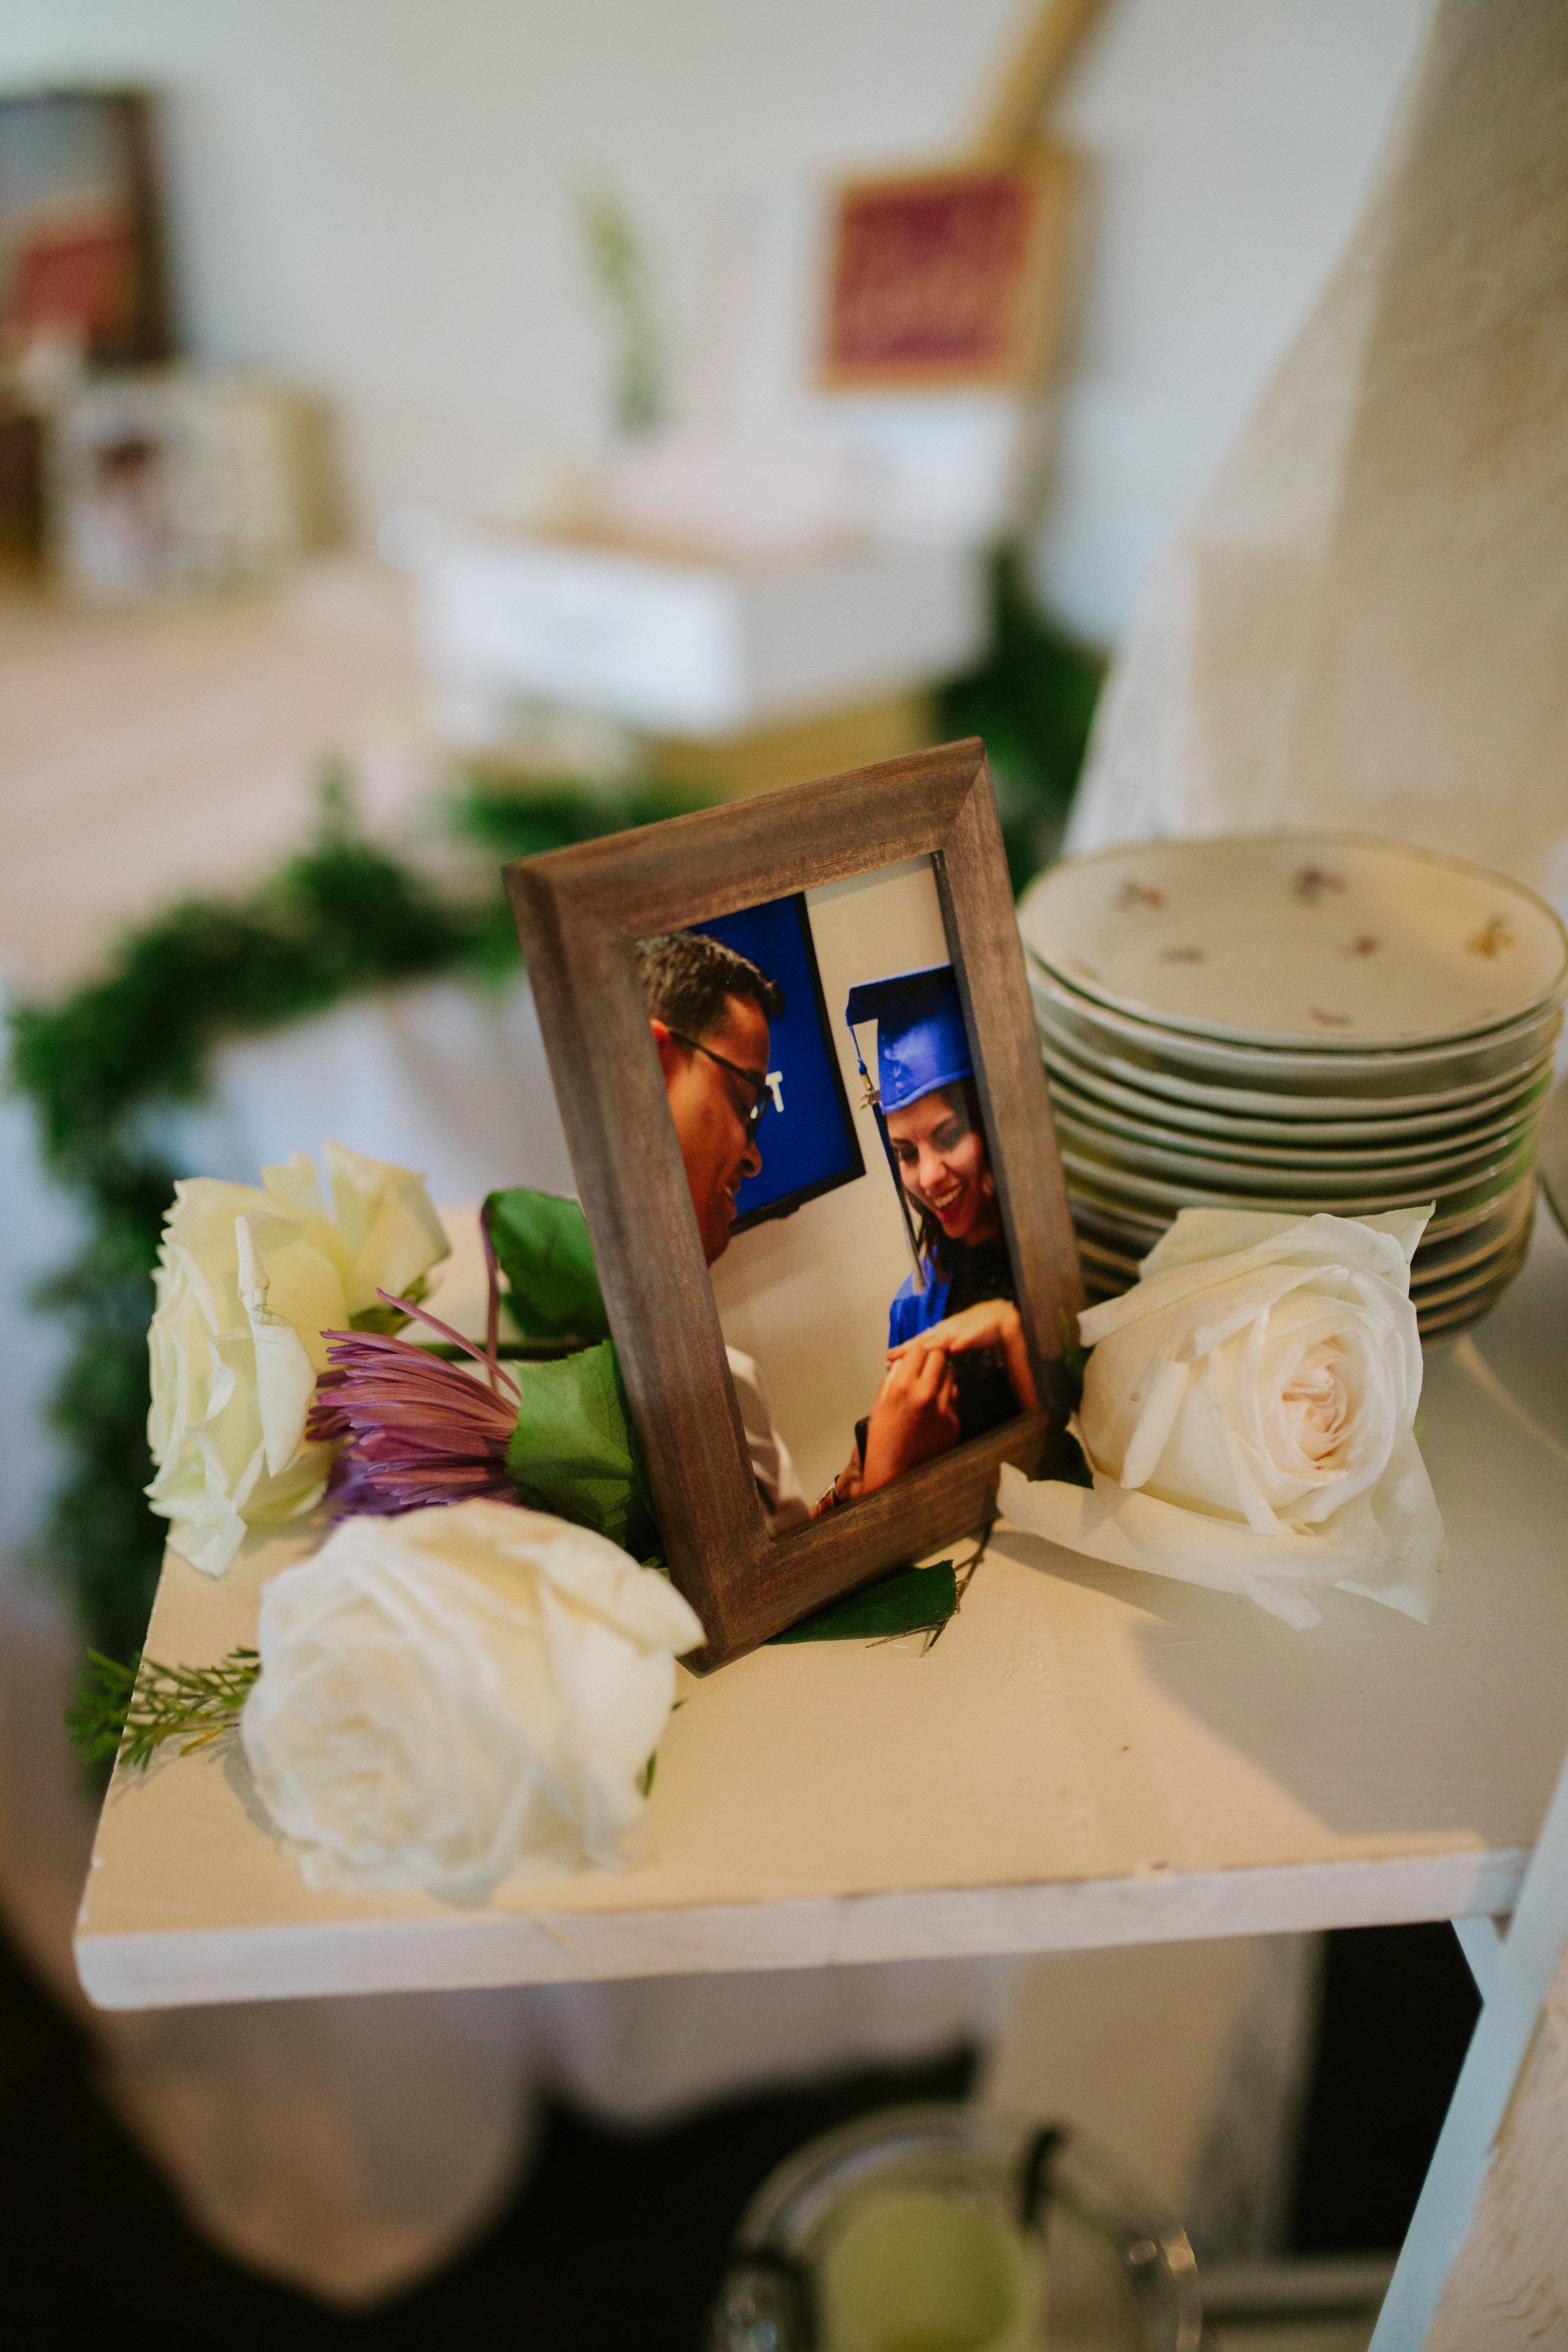 2017.05.23 Barbara and Mauricio Sales Port St Lucie Wedding (207 of 772).jpg